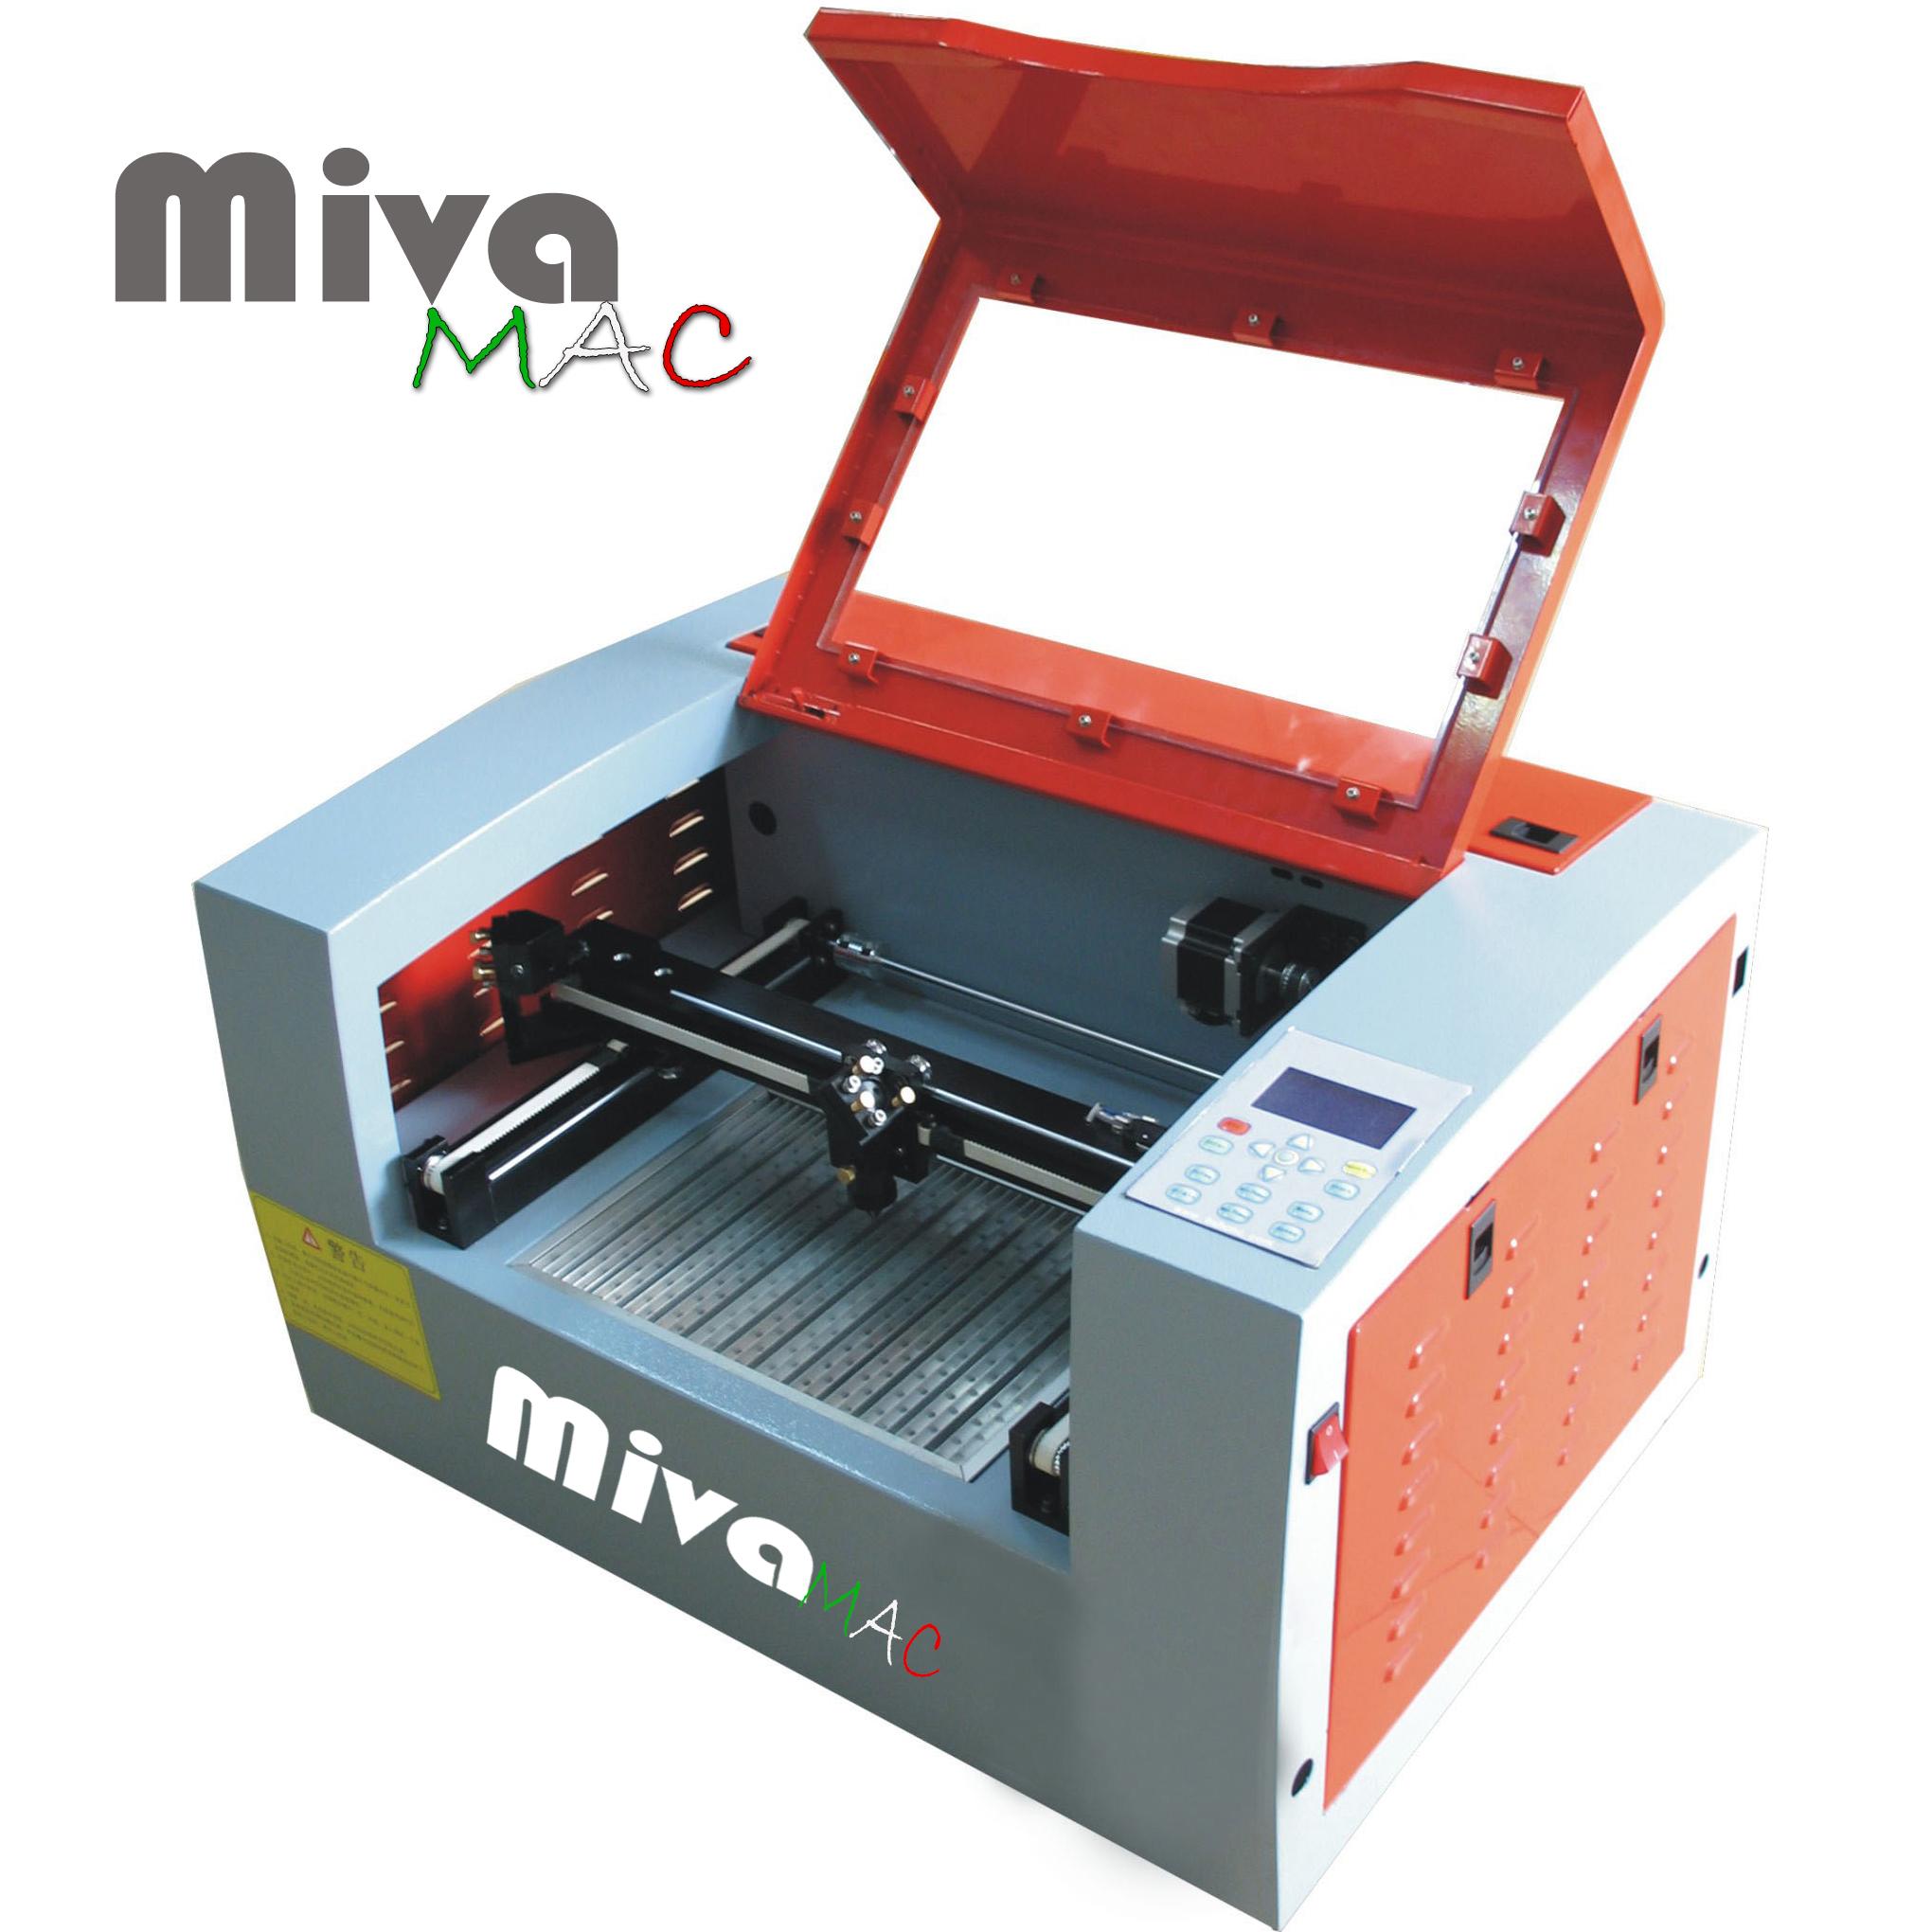 mivamac model IVA TL14090 masina de taiat cu laser si gravat